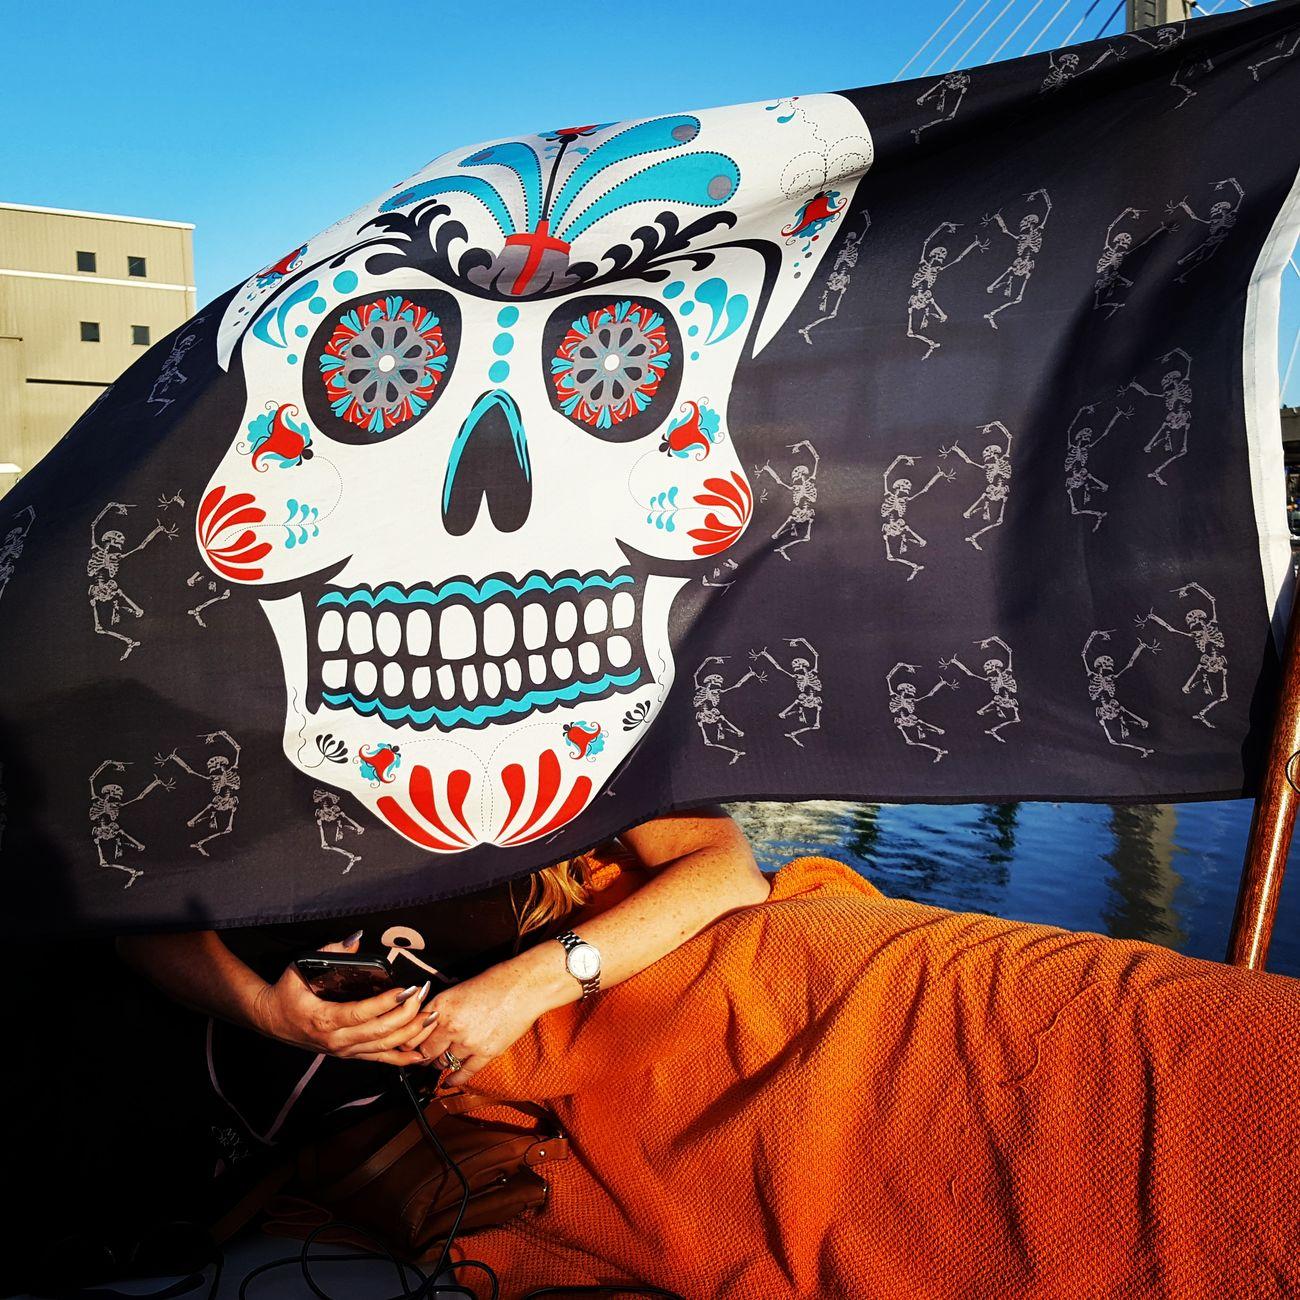 Boat fun. Onaboat Boatlife Boat Ride Flag Skulls Lifeonthewater Commencementbay Ttown Tacoma_WA Skullporn